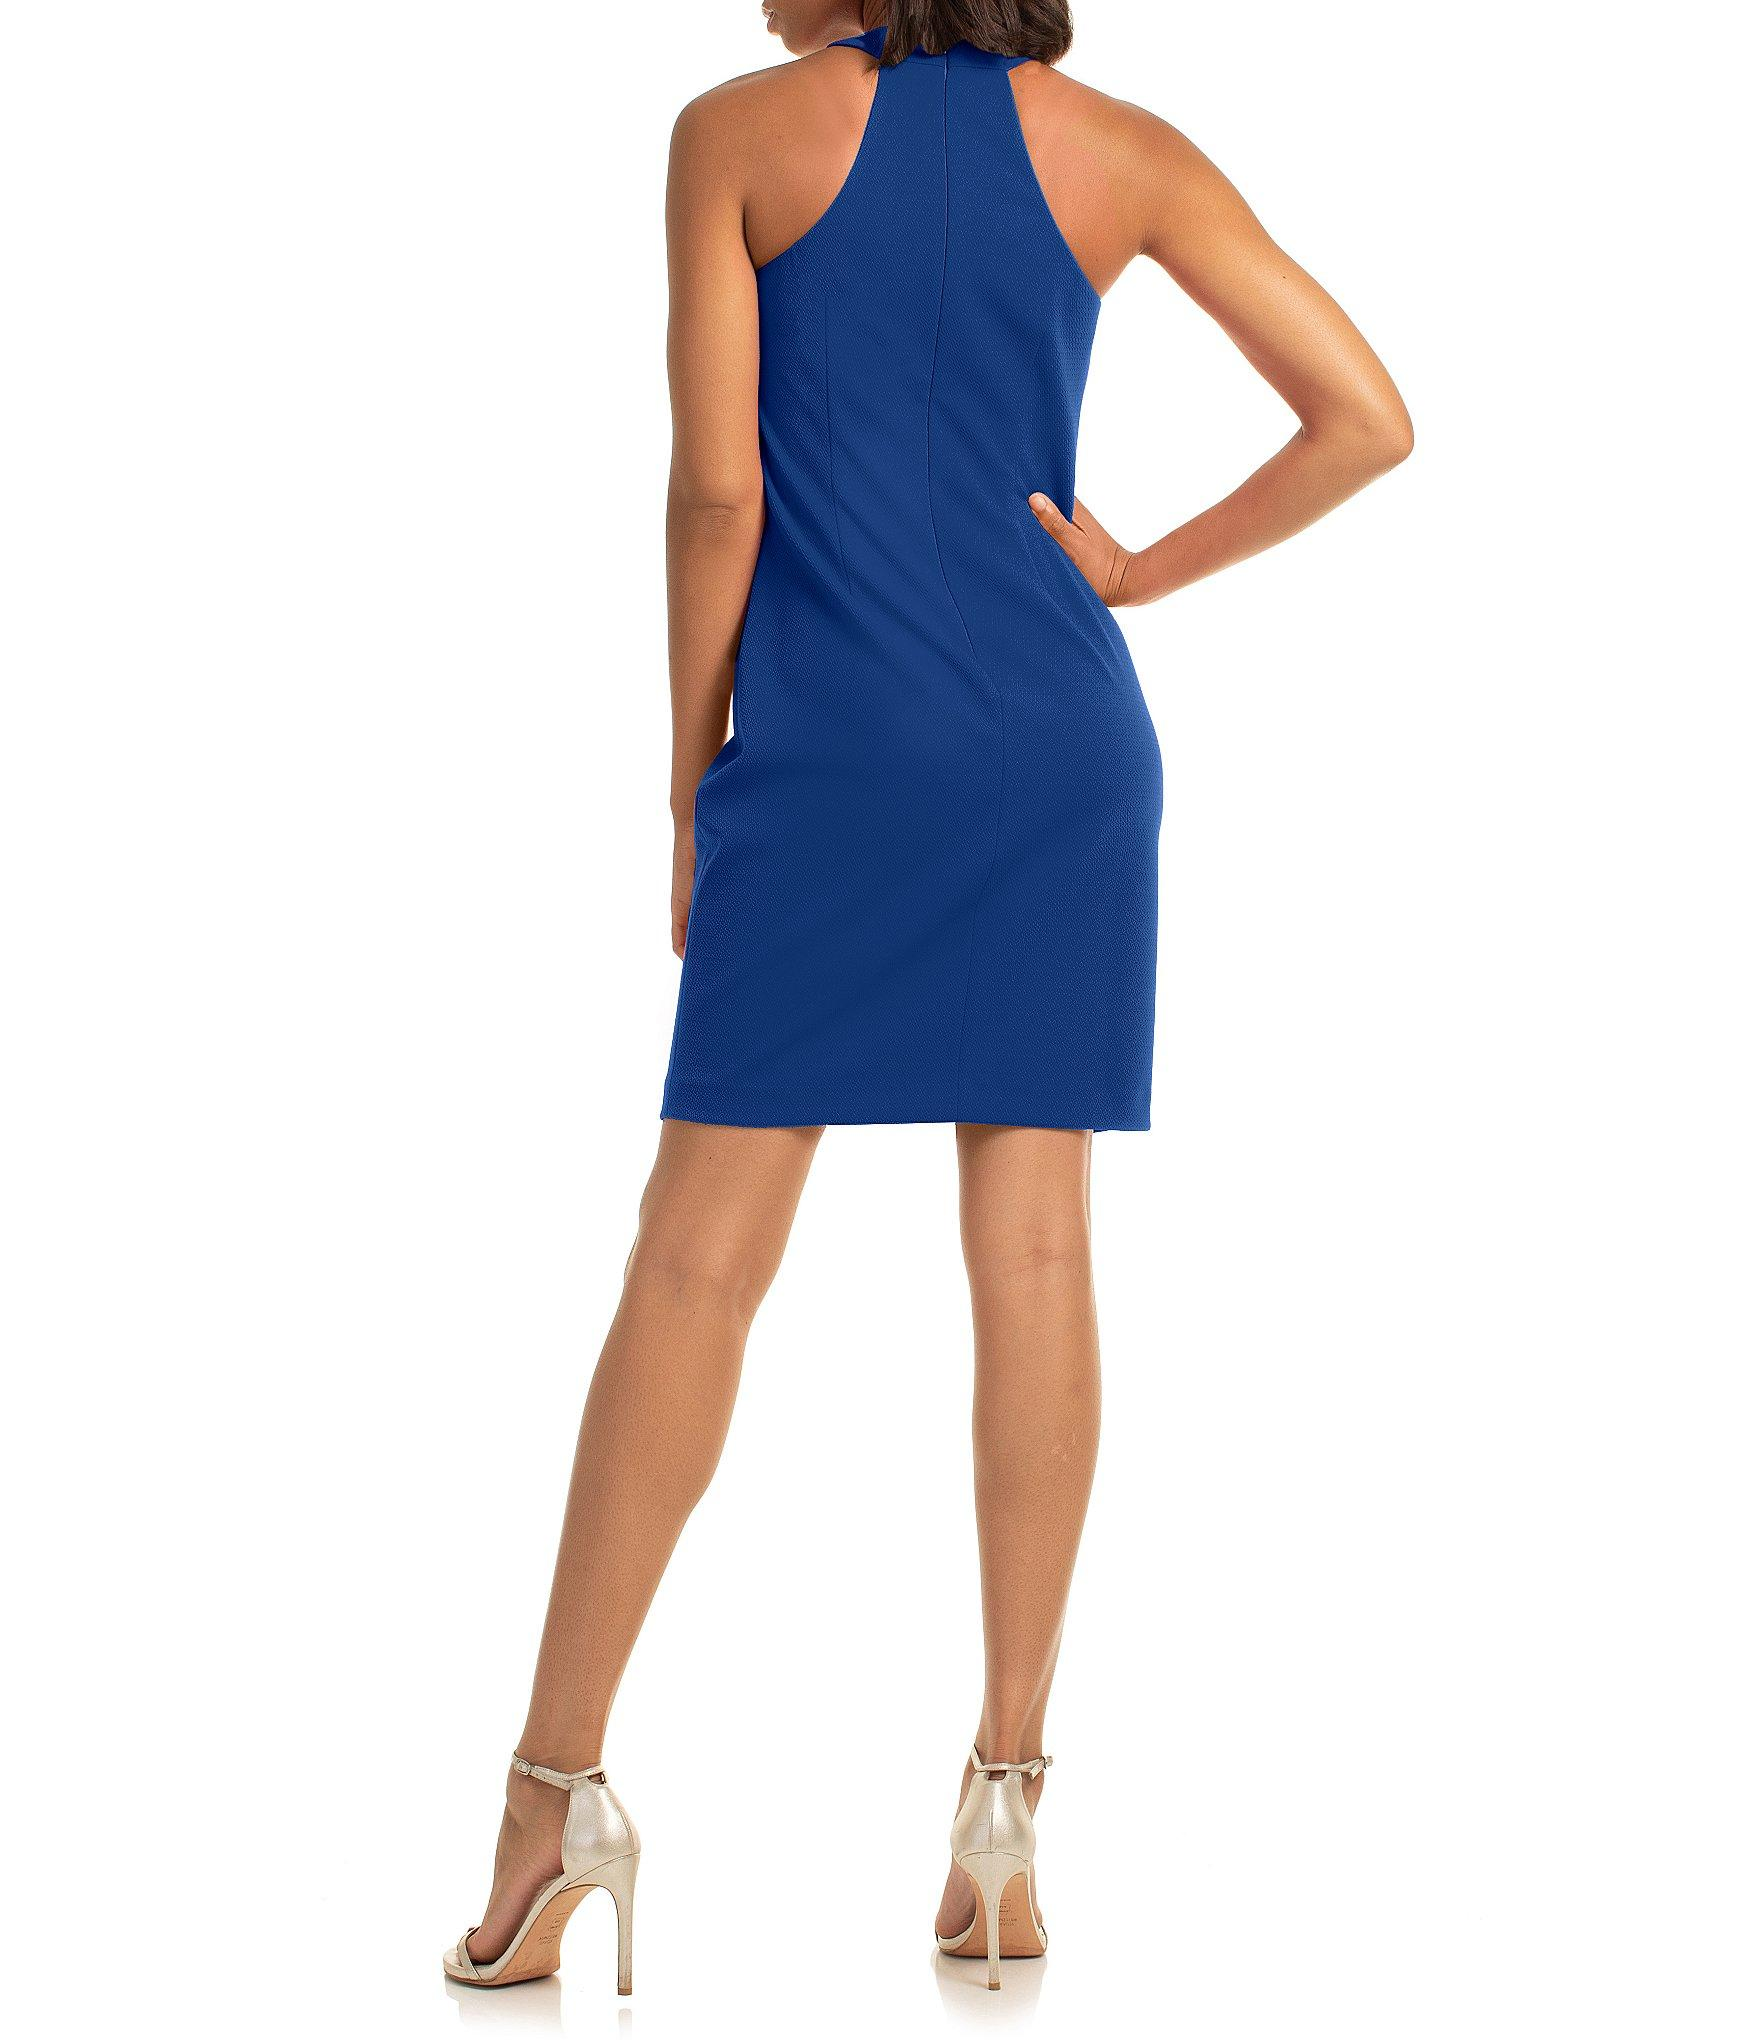 d6de884f Trina Turk - Blue Trina Keyhole Halter Neck Sheath Dress - Lyst. View  fullscreen